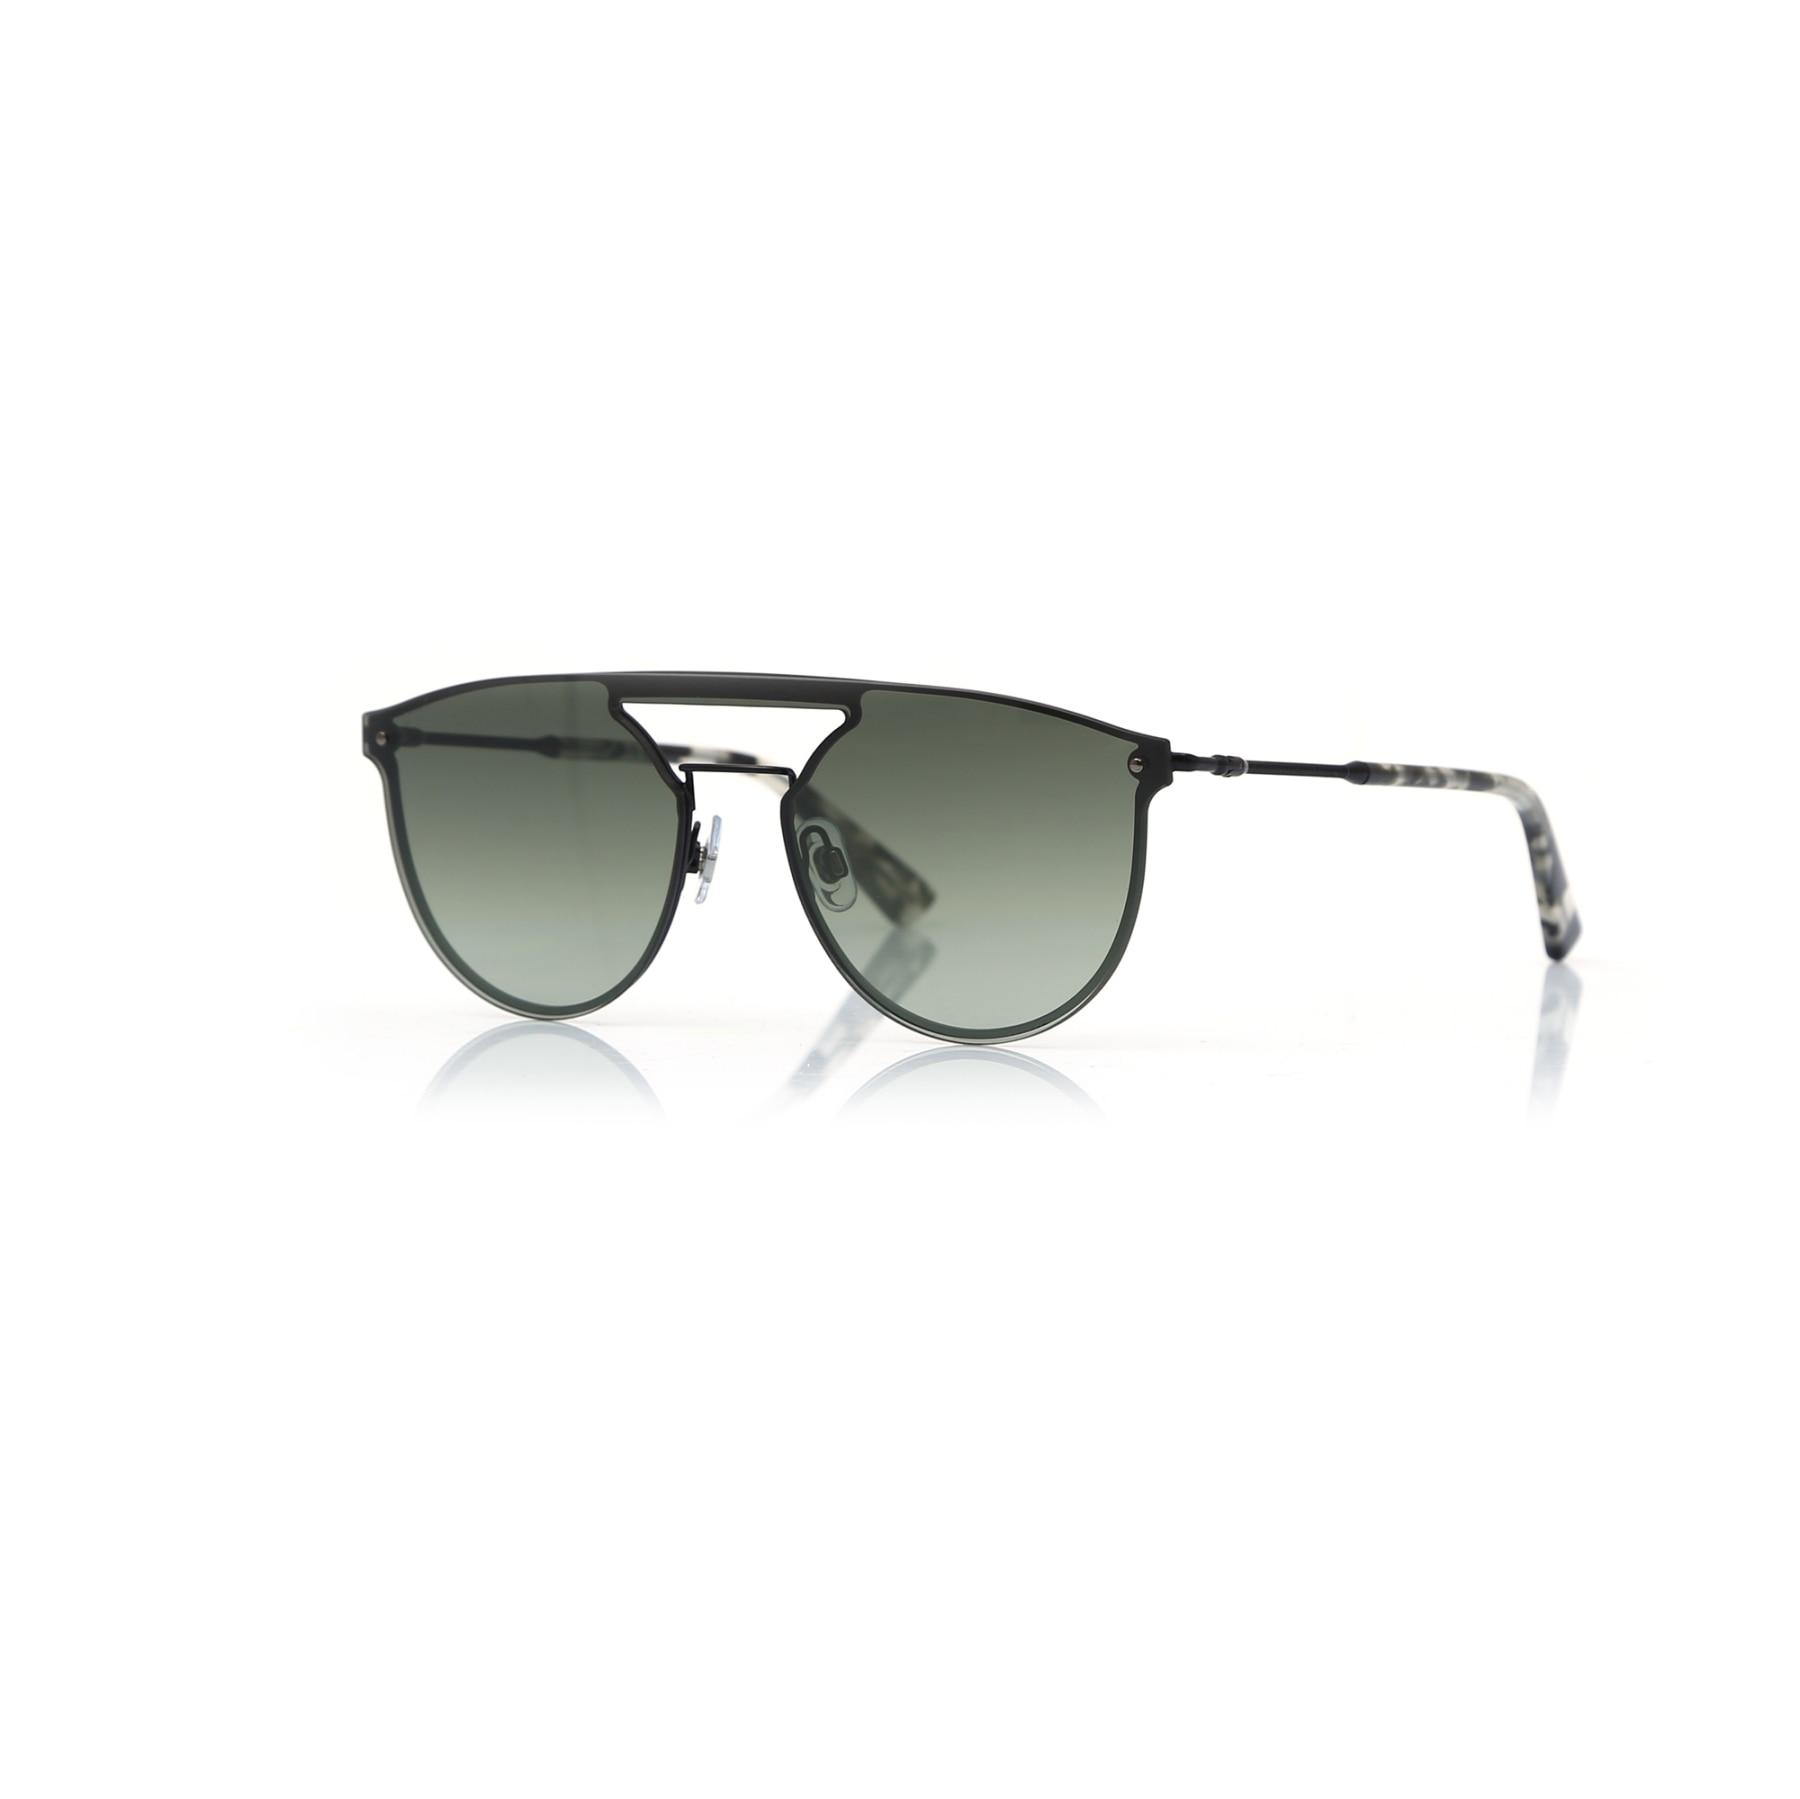 Unisex sunglasses w 0193 02q metal black polycarbonate oval aval 54-16-140 web